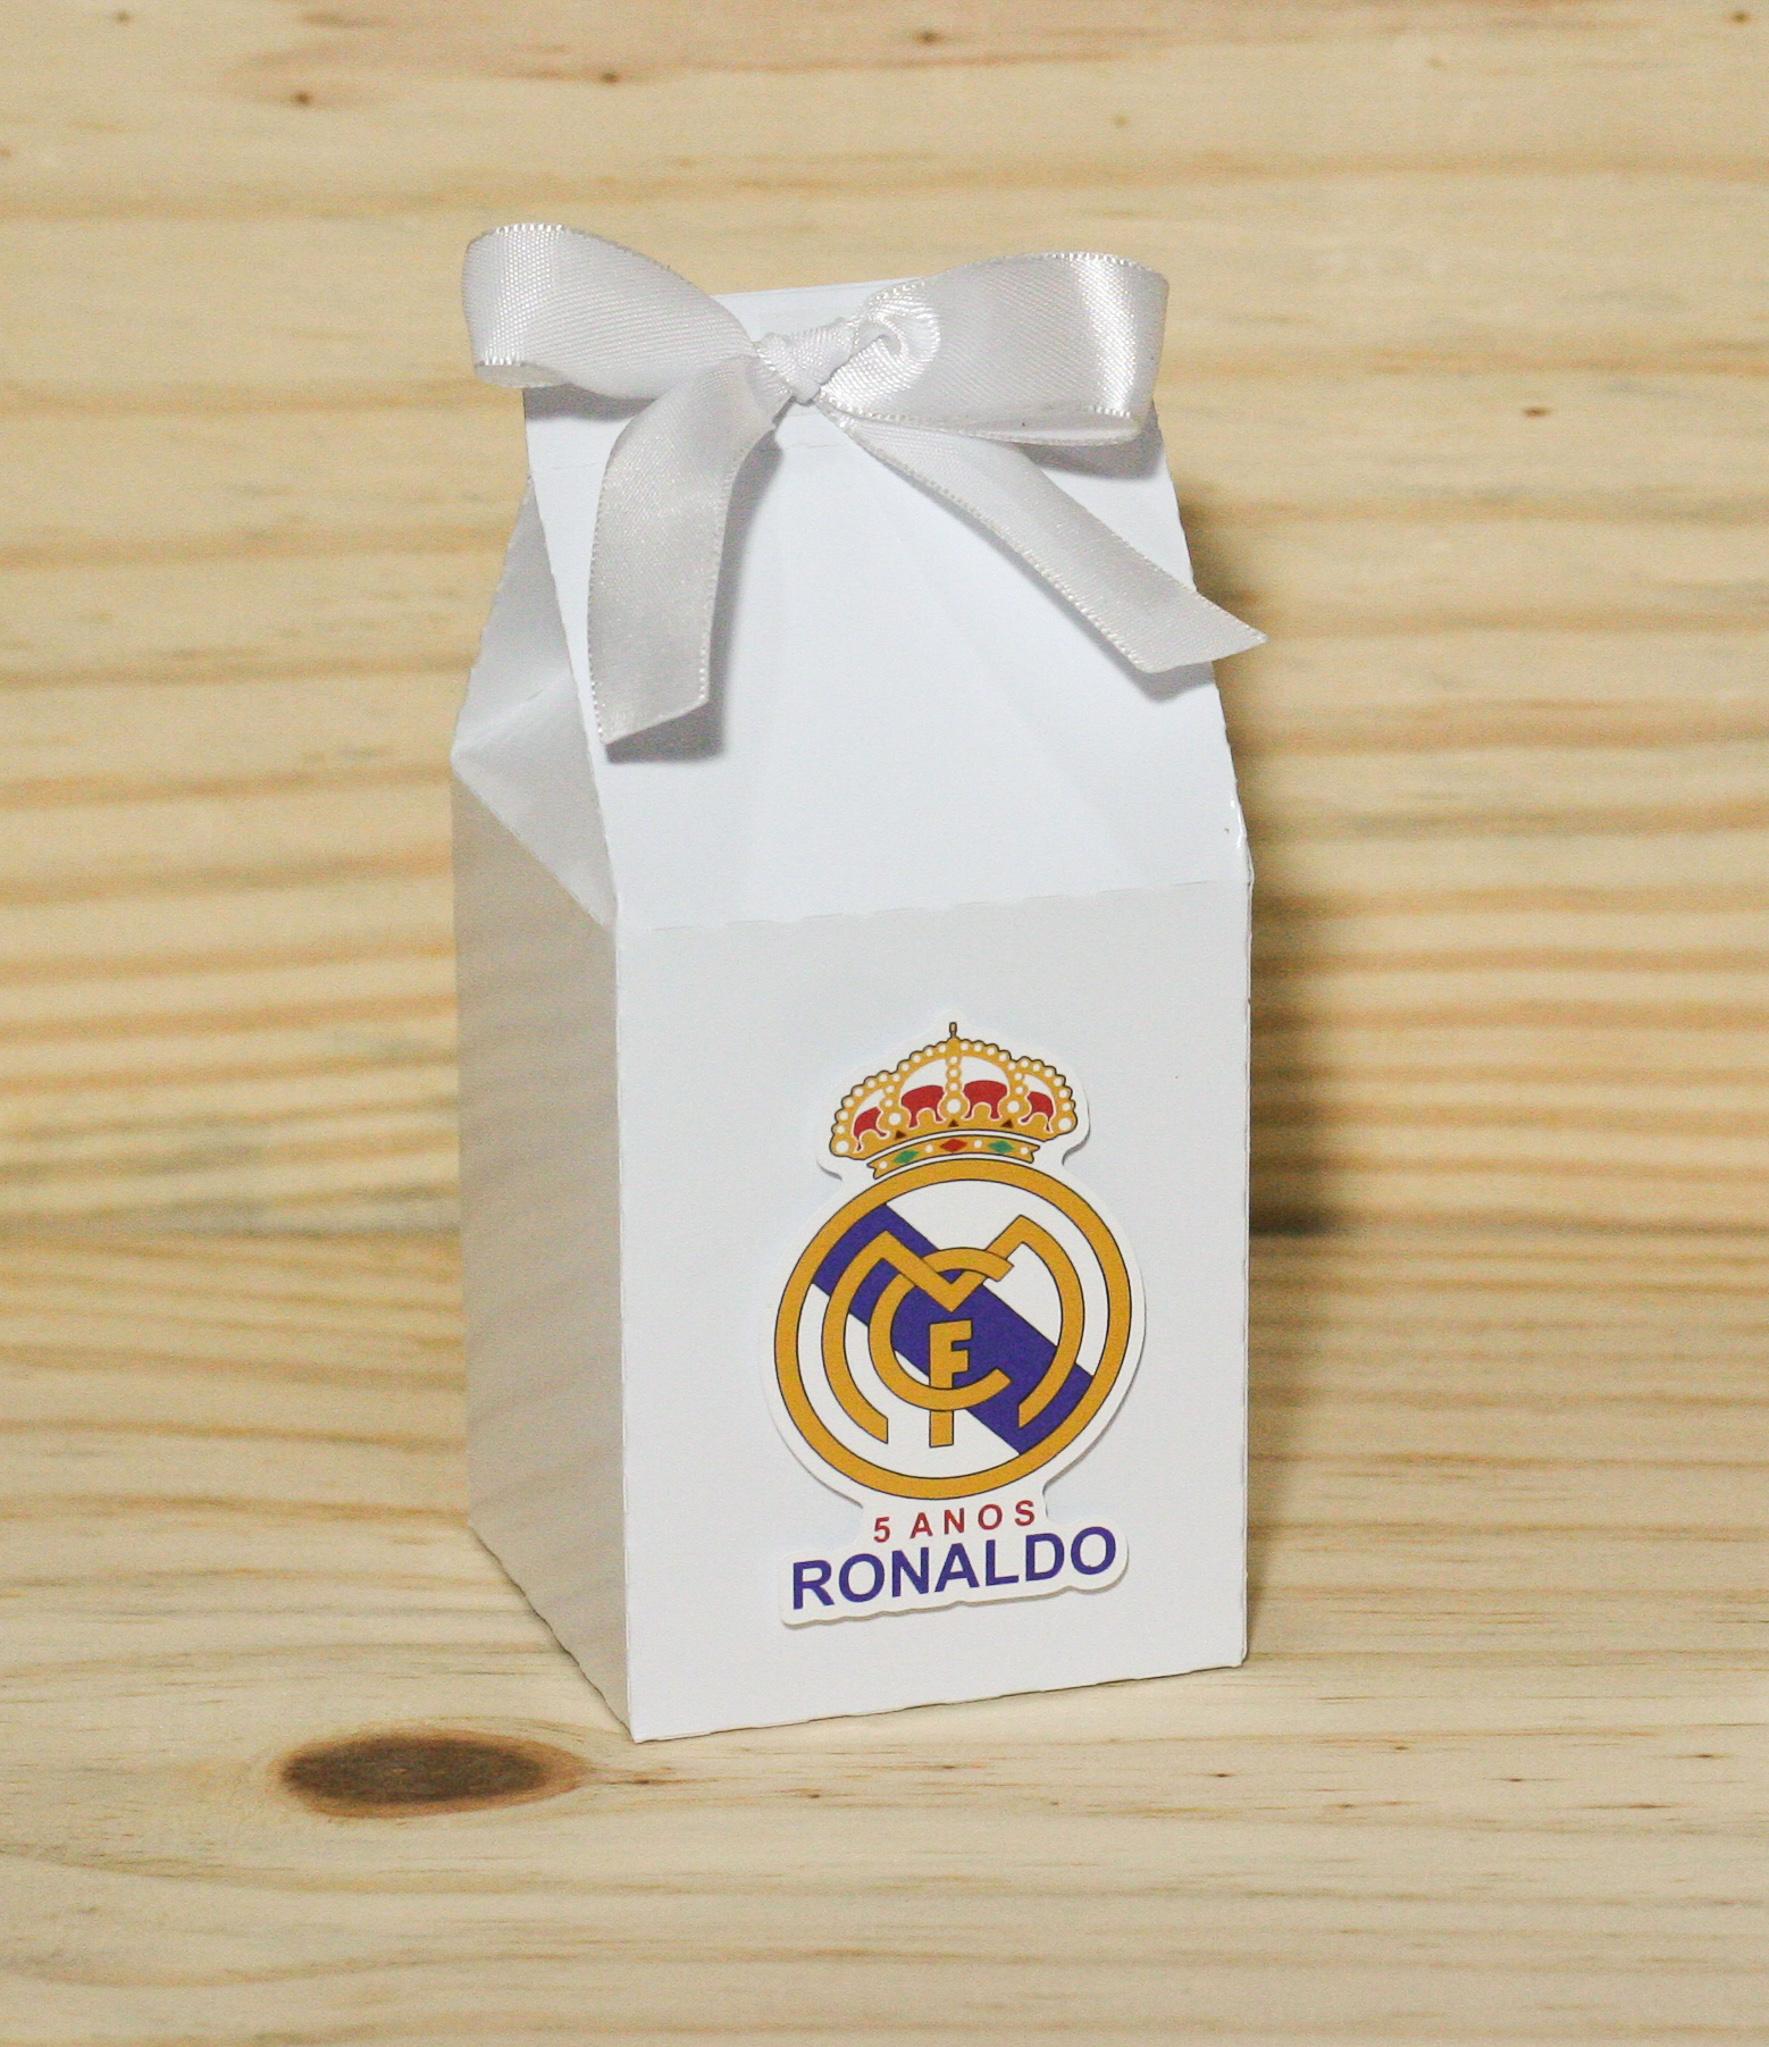 686e986568 Caixa Camisa Futebol Real Madrid